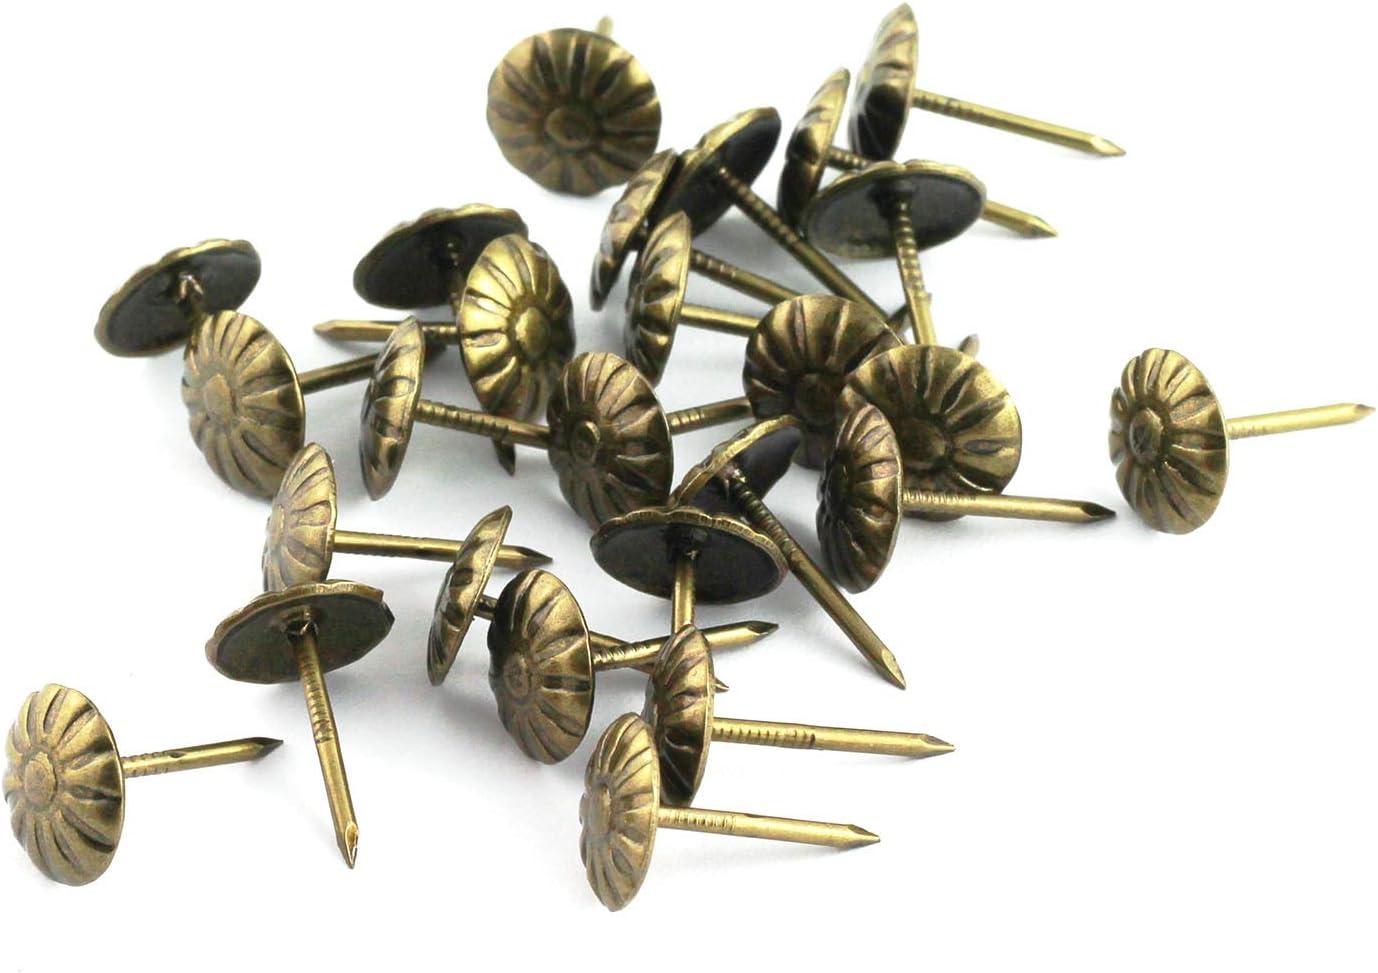 RuiLing 150pcs Upholstery Tacks Stud Elegant Vintage Antique Brass Pushpin Doornail Round Dome Head Furniture Decoration Nails Pins Green Bronze 11x17mm